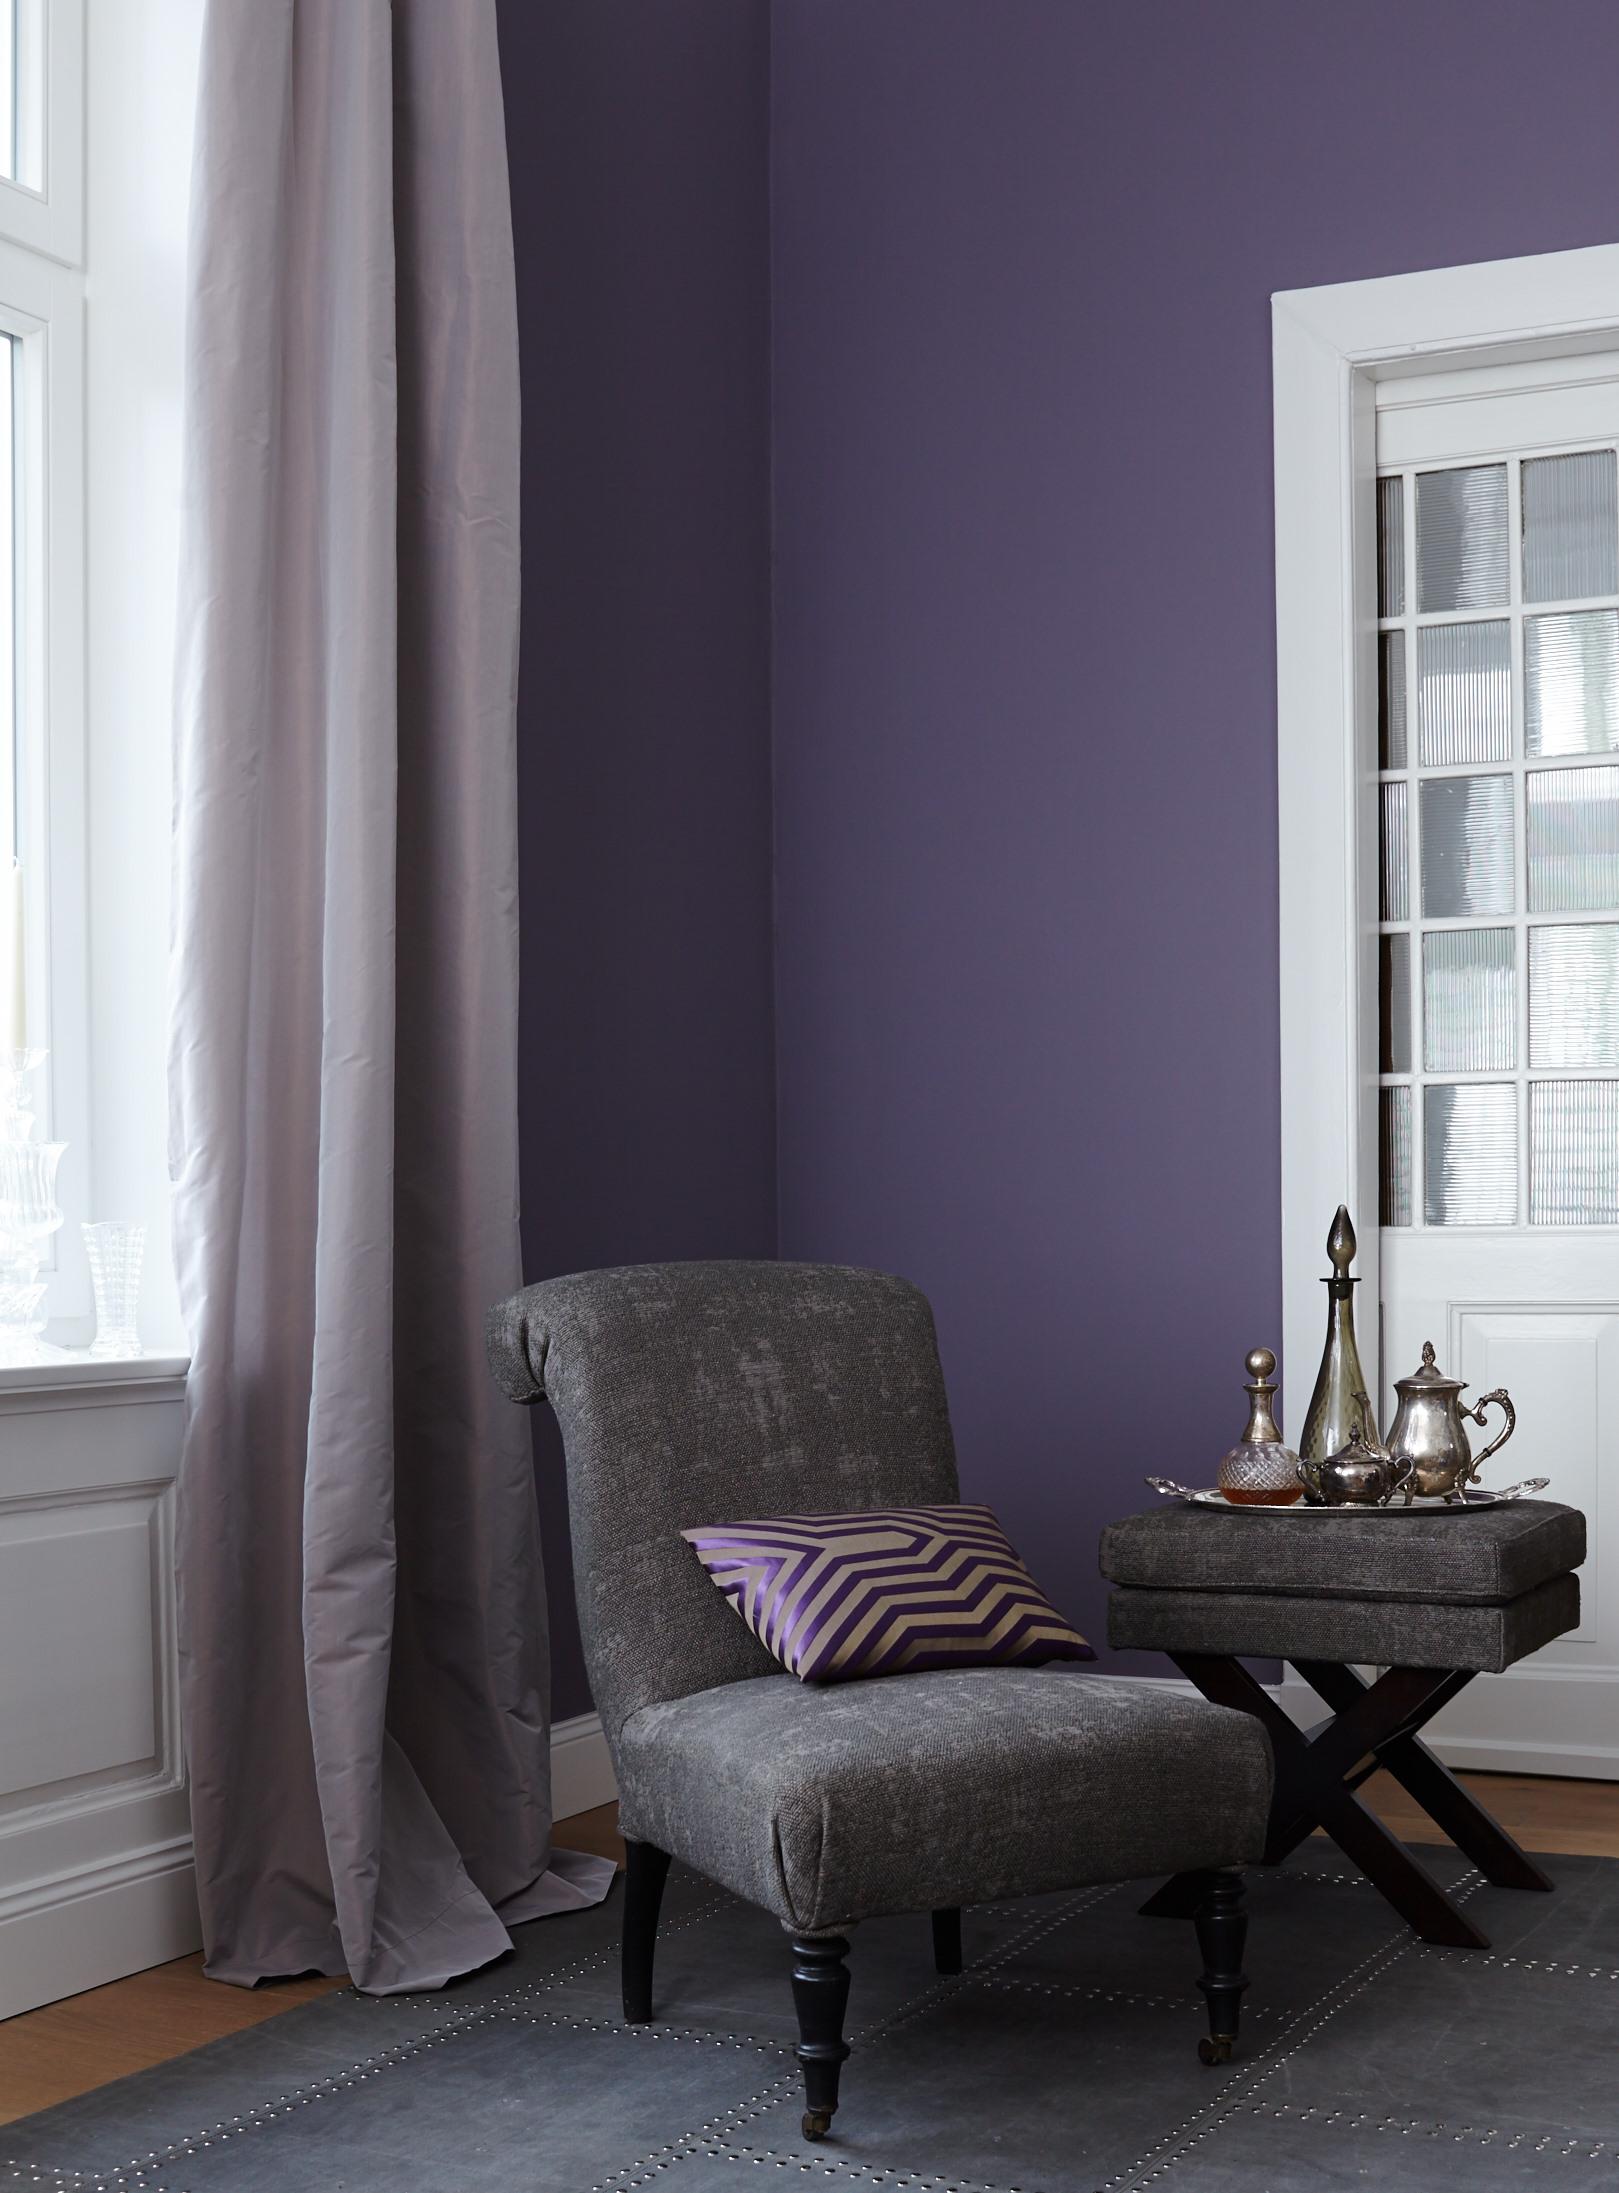 Farb wirkung von violett im raum alpina farbe wirkung for Wandfarbe lila wirkung